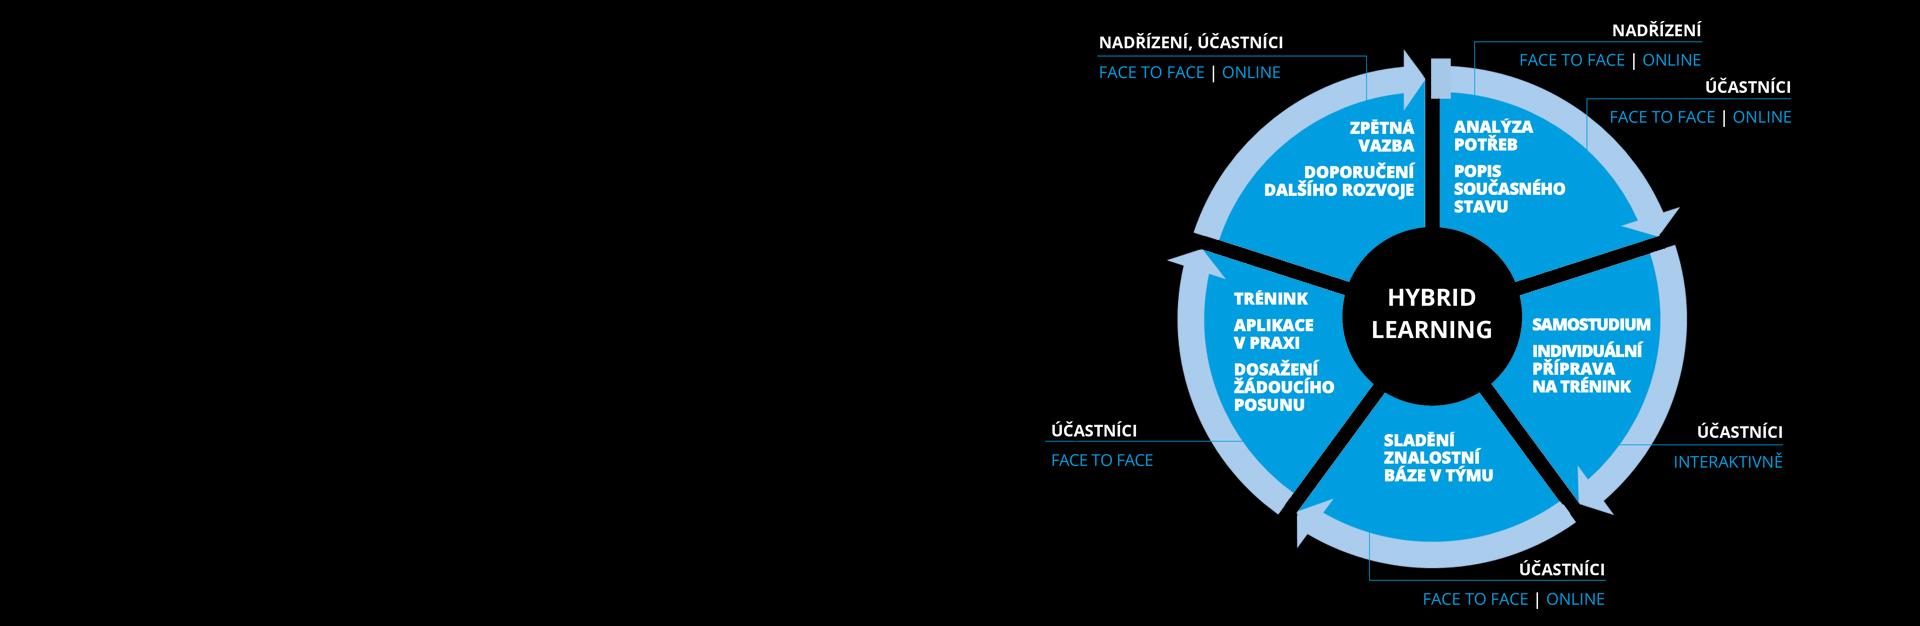 rozvoj-hybridlearning